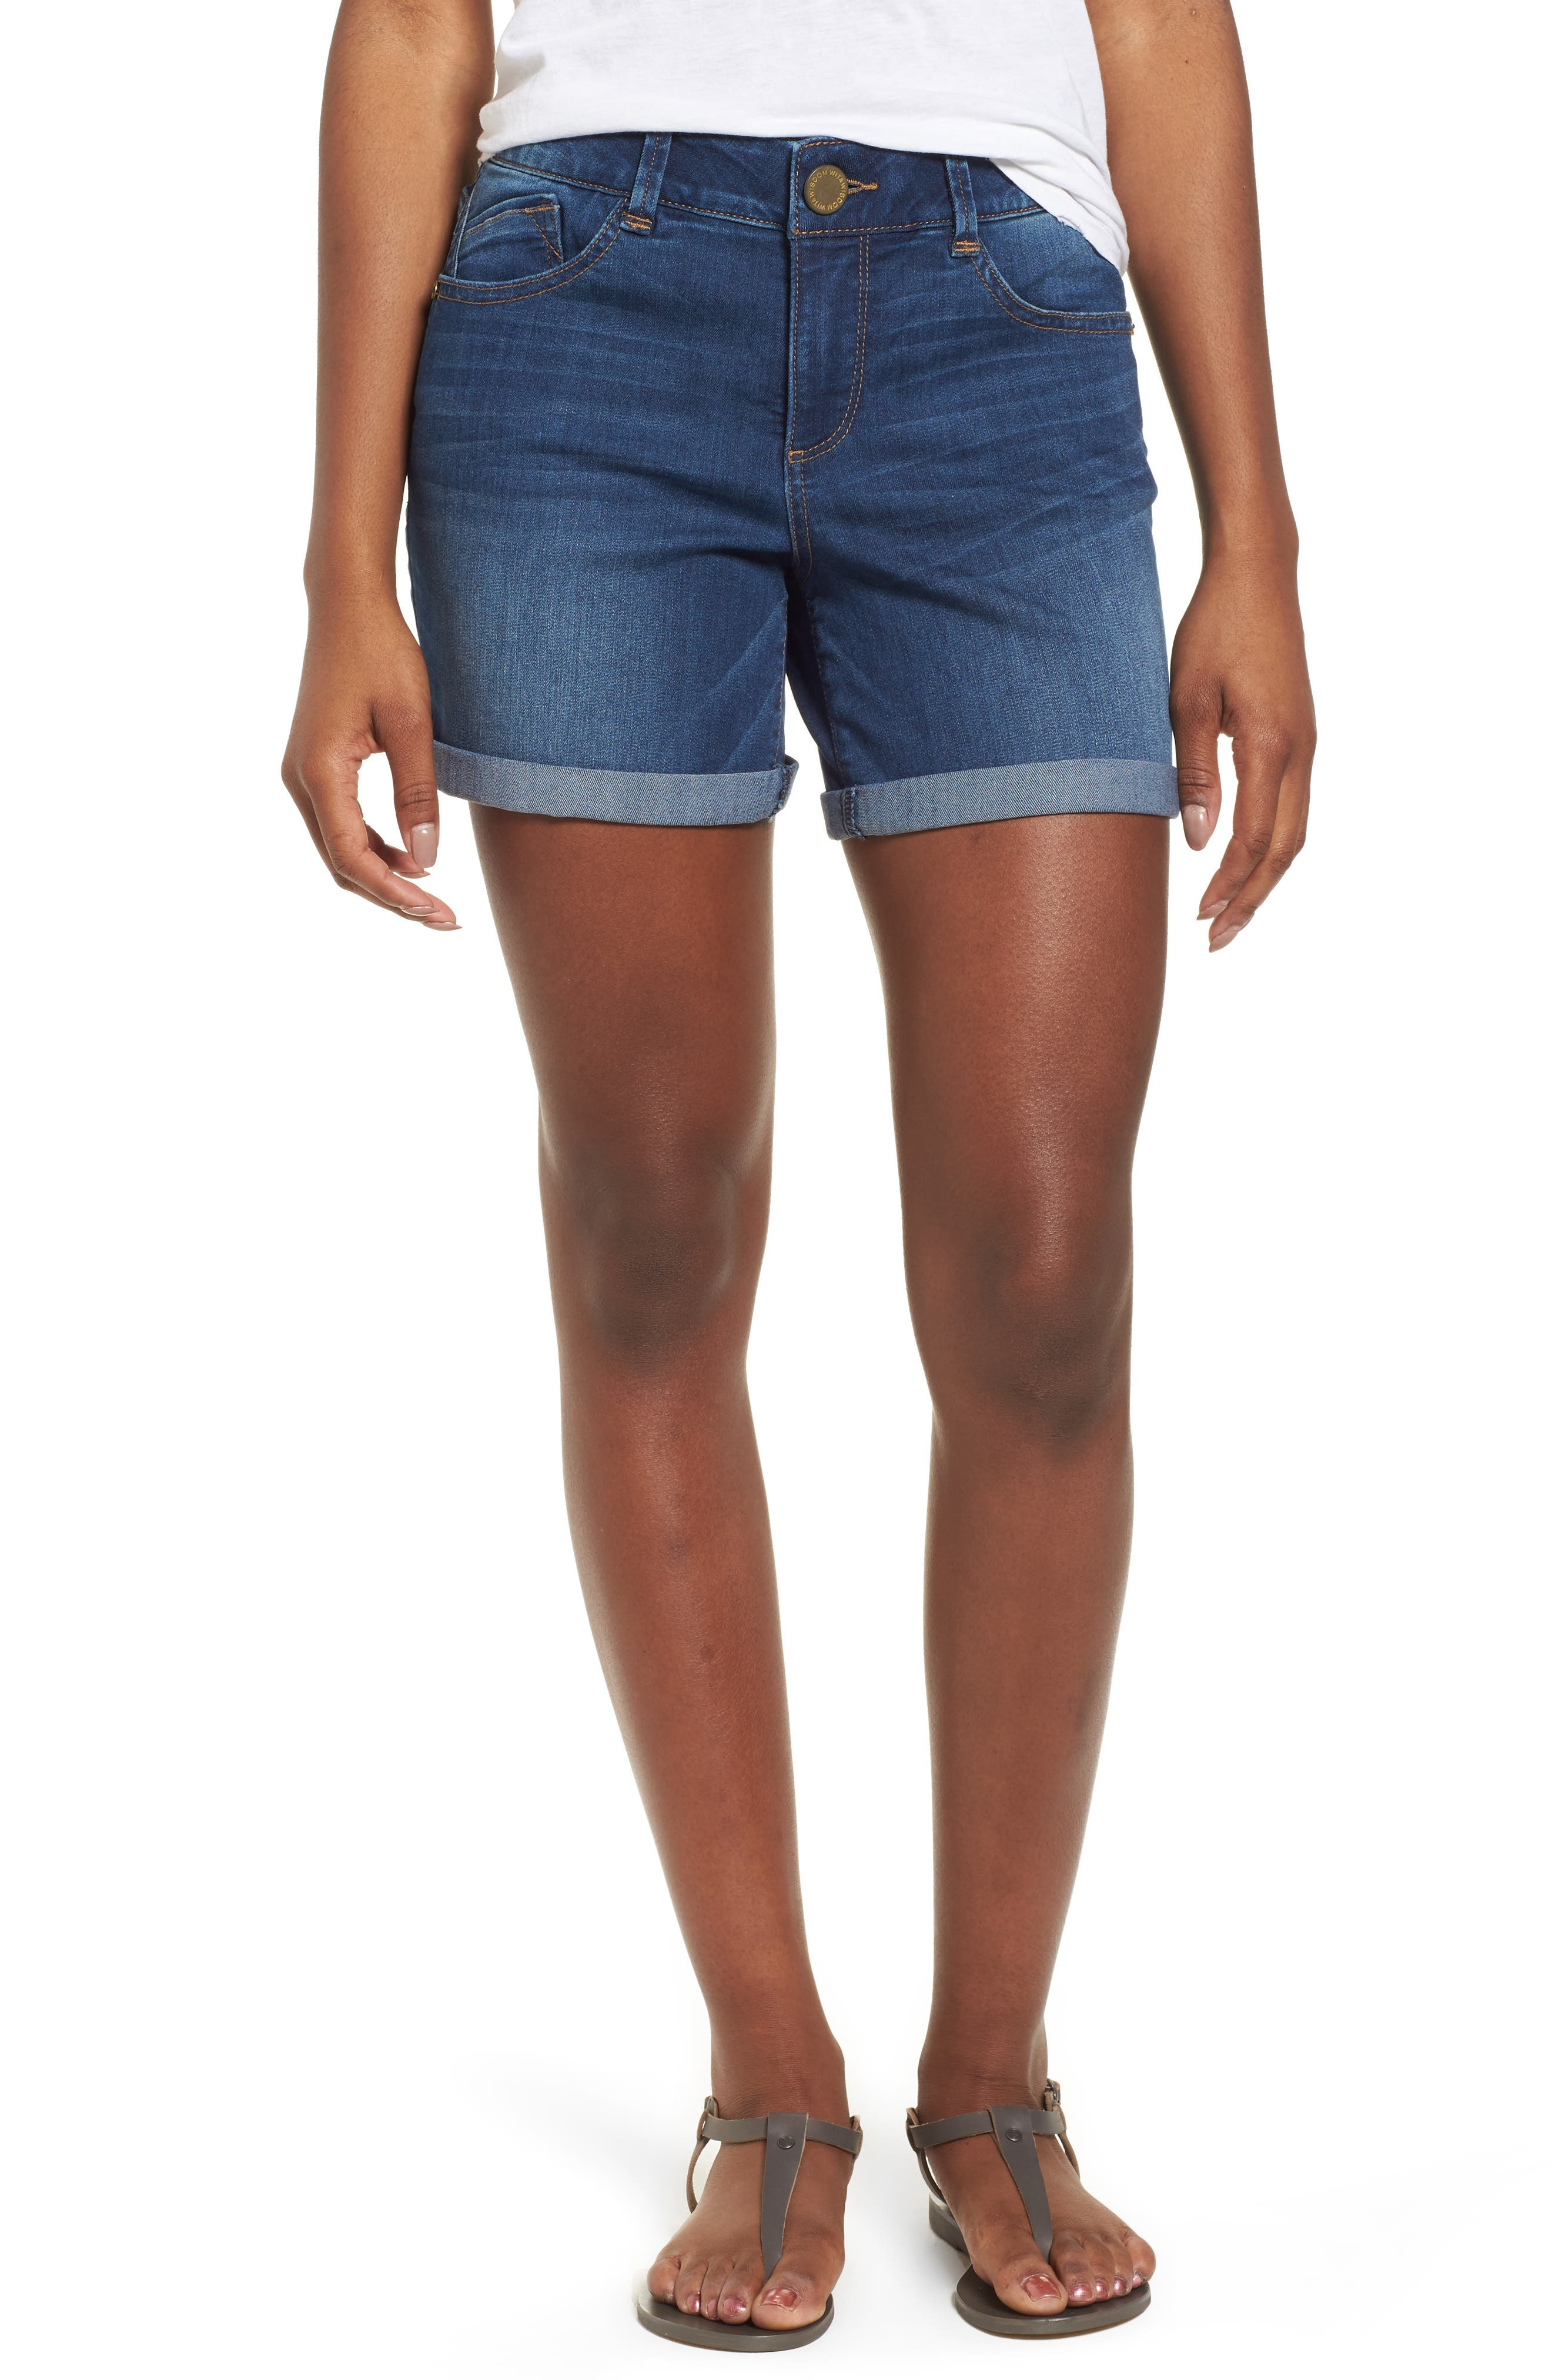 WIT & WISDOM, Ab-solution Cuffed Denim Shorts, Main thumbnail 1, color, BLUE